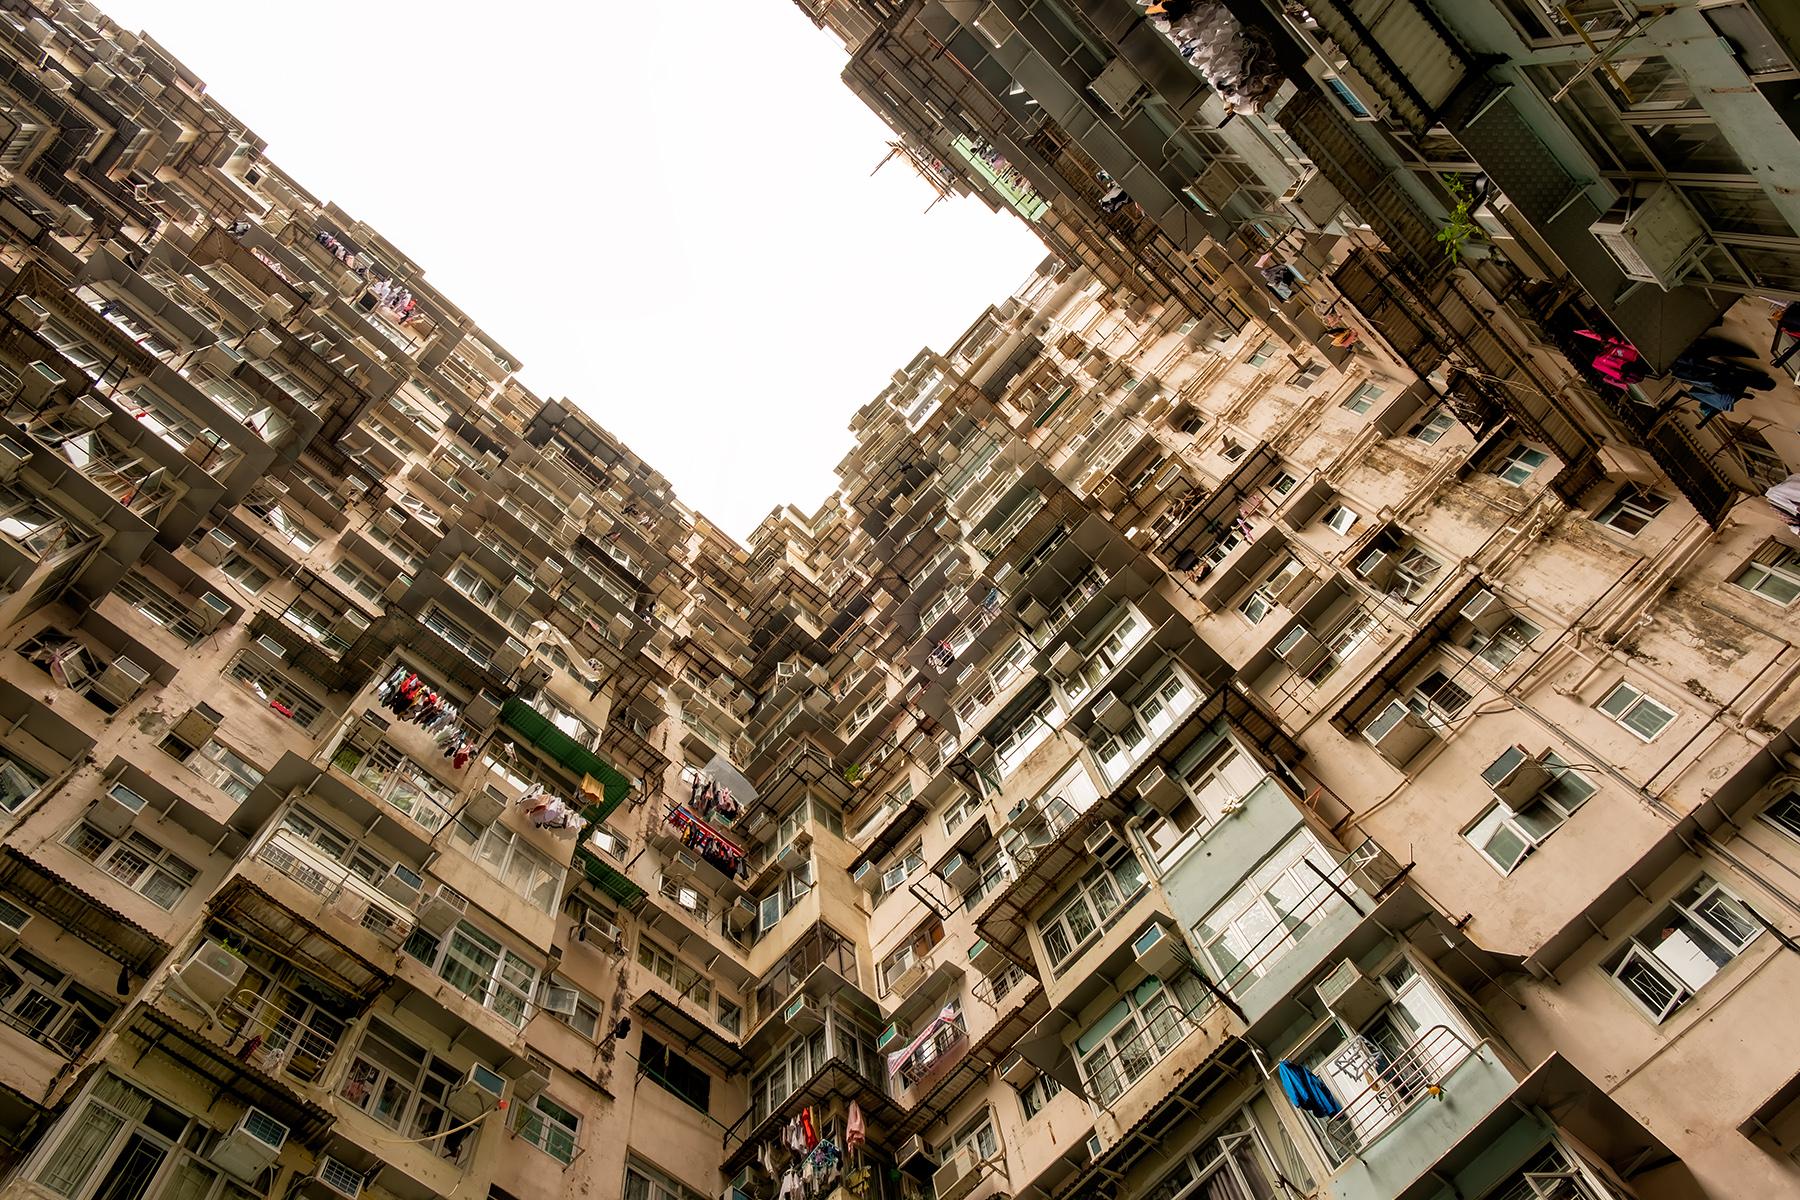 Doug_Caplan_Hong-Kong-Brutal-Compressions_Untitled_02.jpg